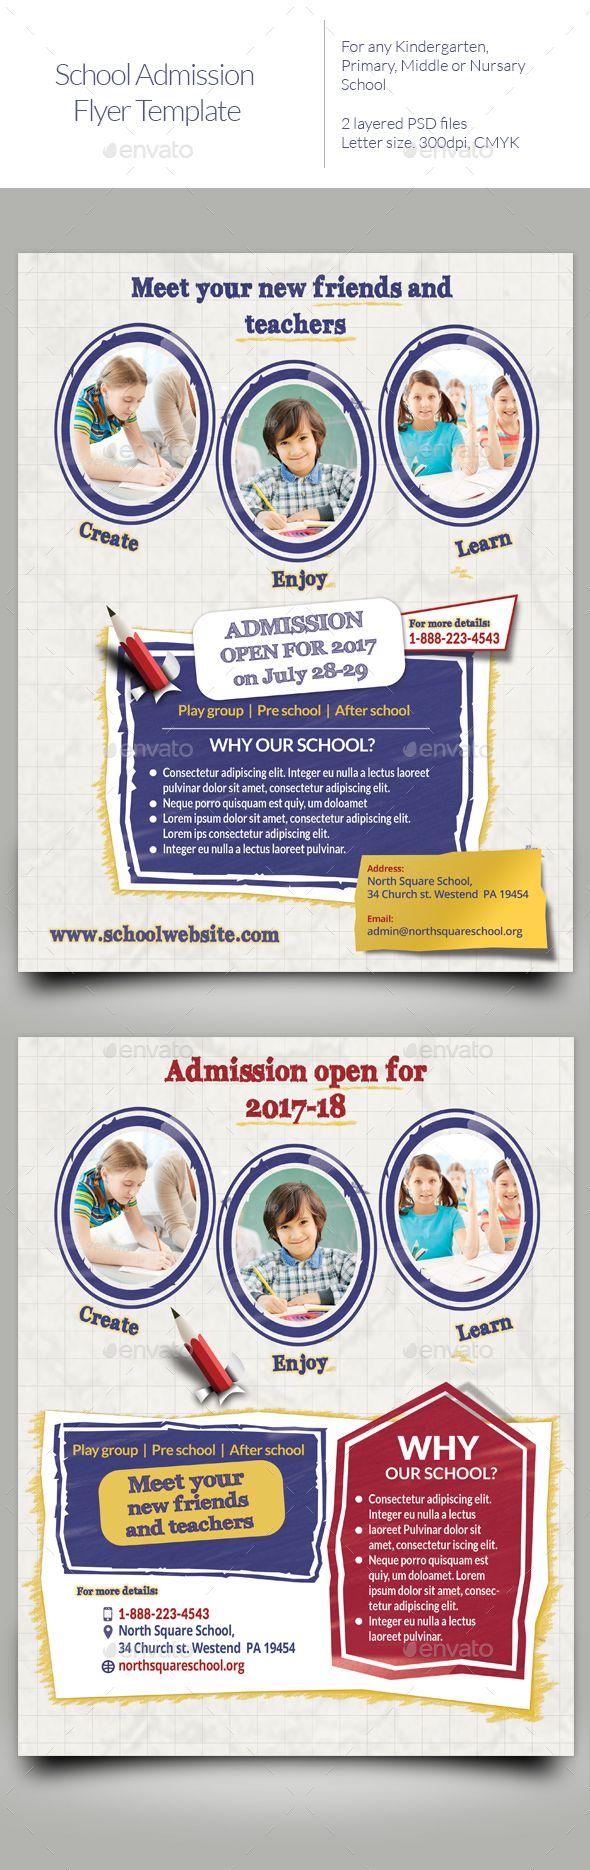 junior school admission flyer template flyers flyer template school admission flyer templates psd template flyer preschool primary